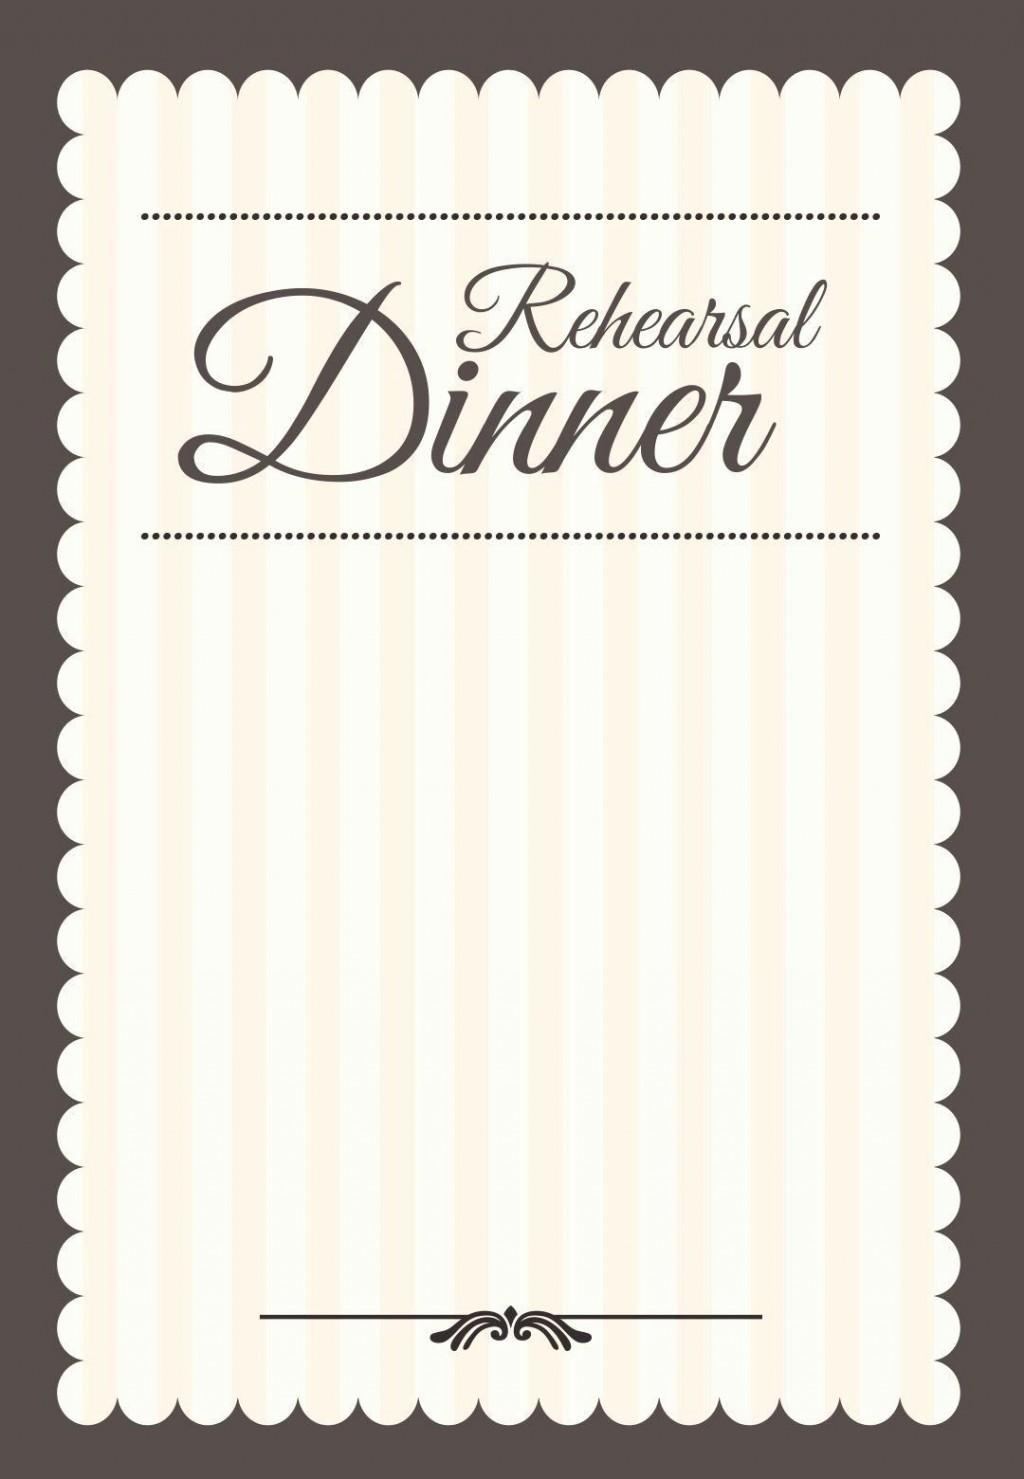 006 Singular Free Dinner Invitation Template High Resolution  Templates Rehearsal Printable Italian ThanksgivingLarge